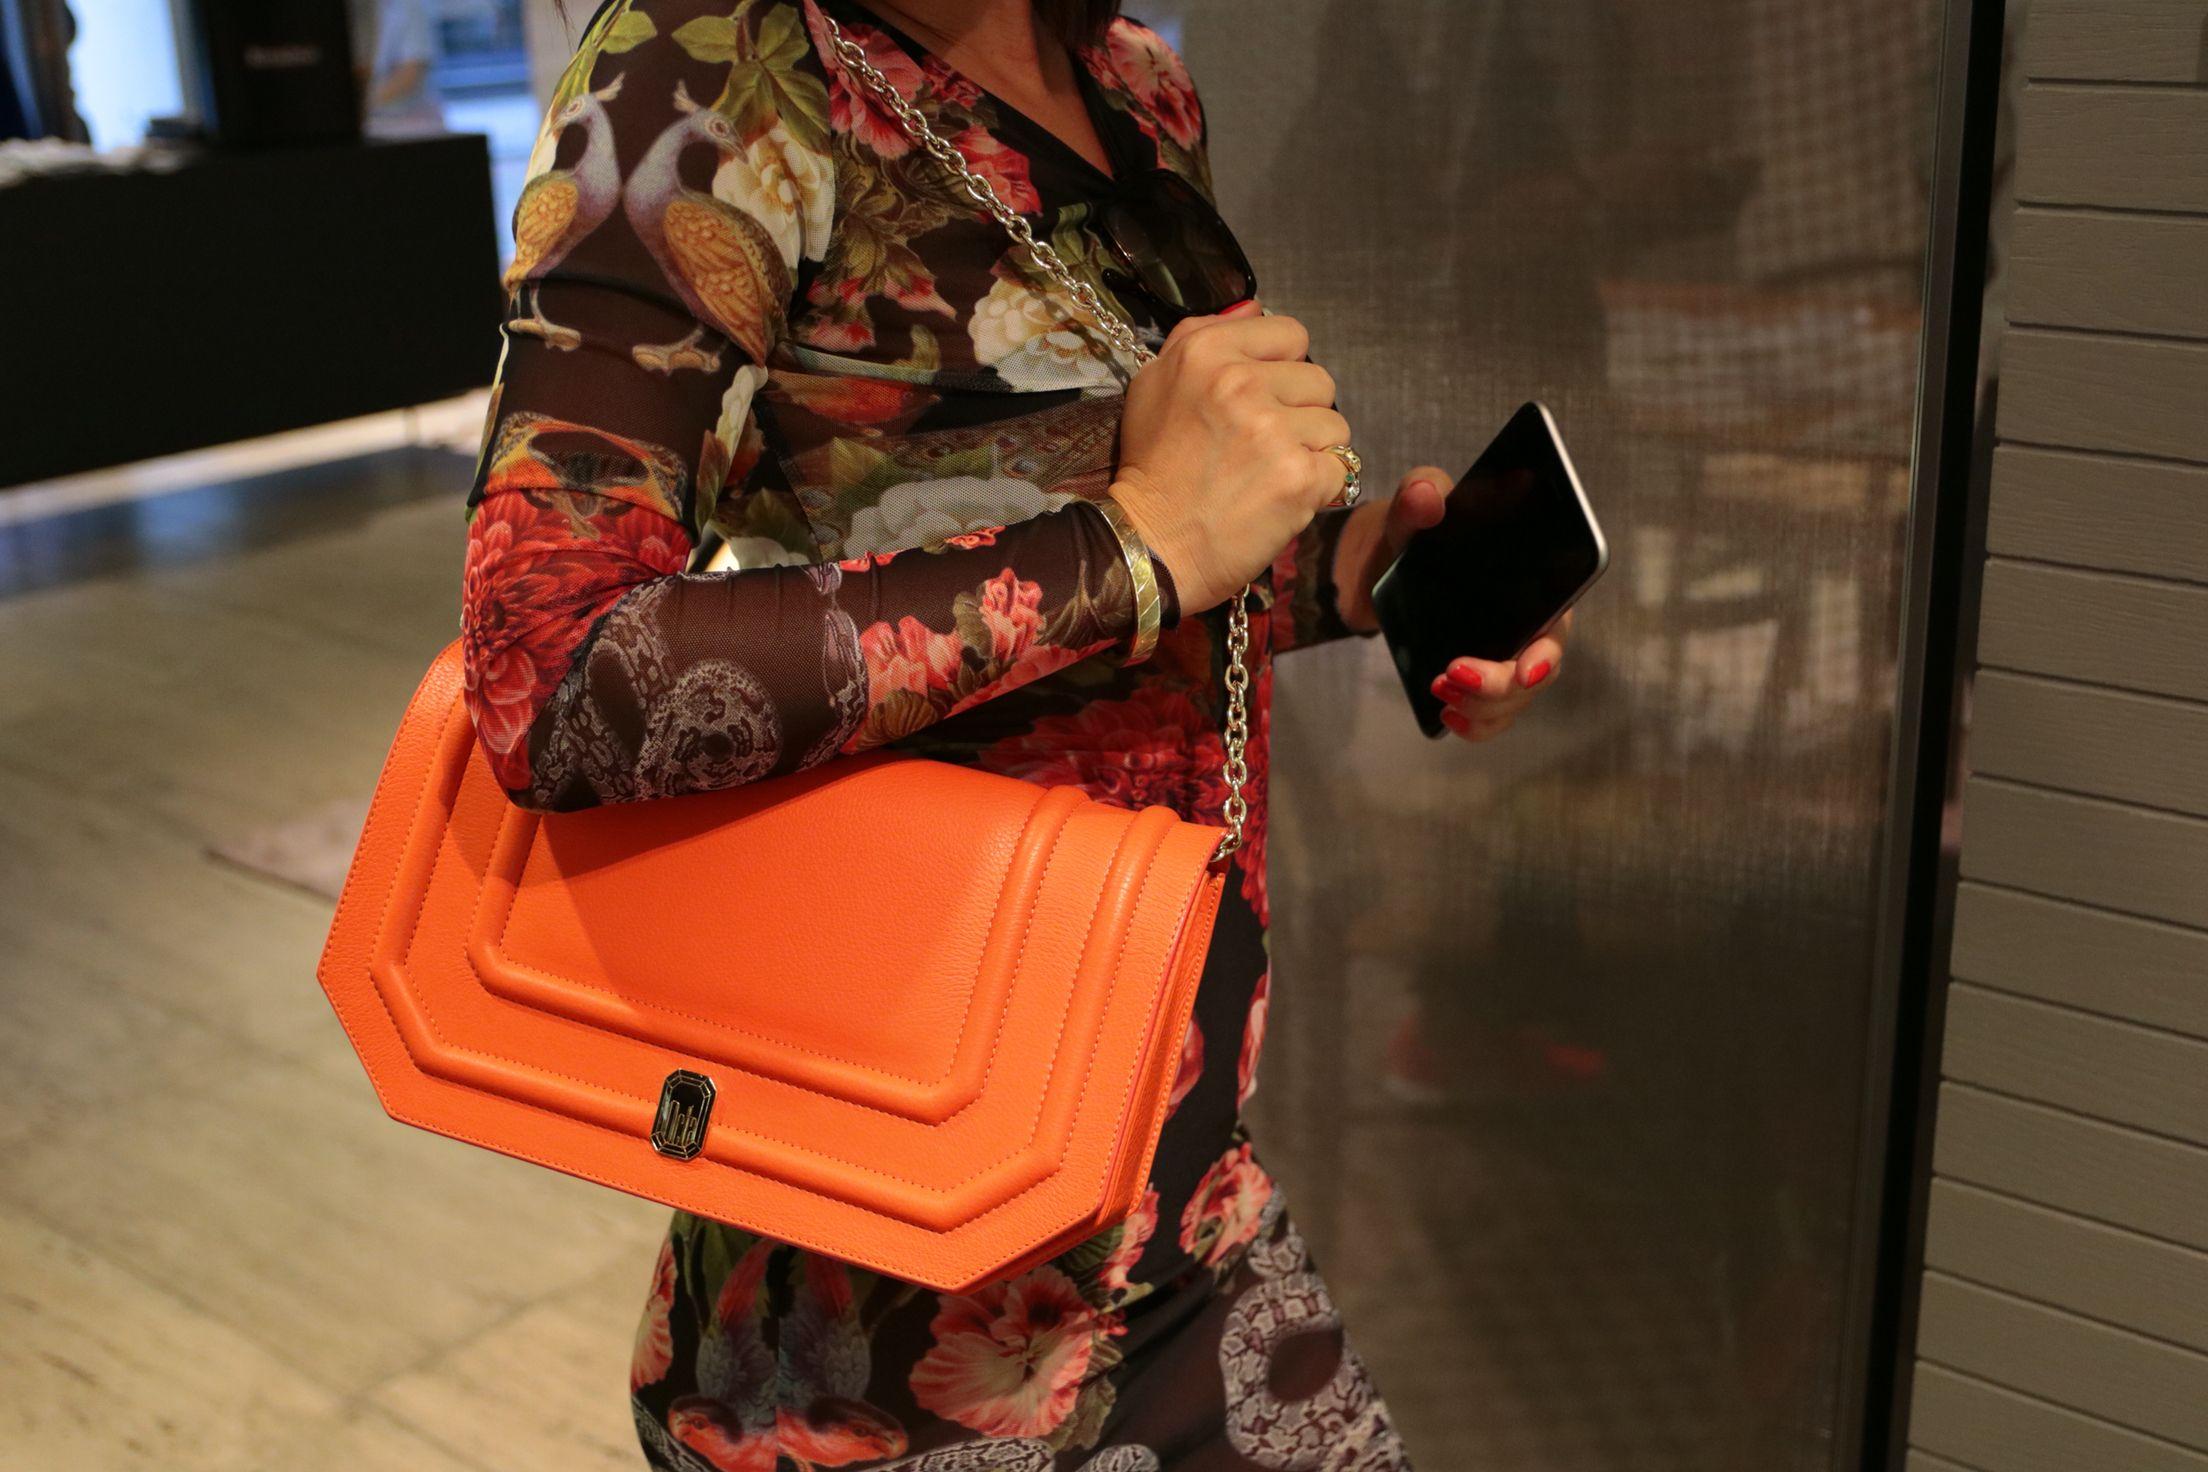 Octa Bag #milano #fashiondetails #fashion #bag #style #moda